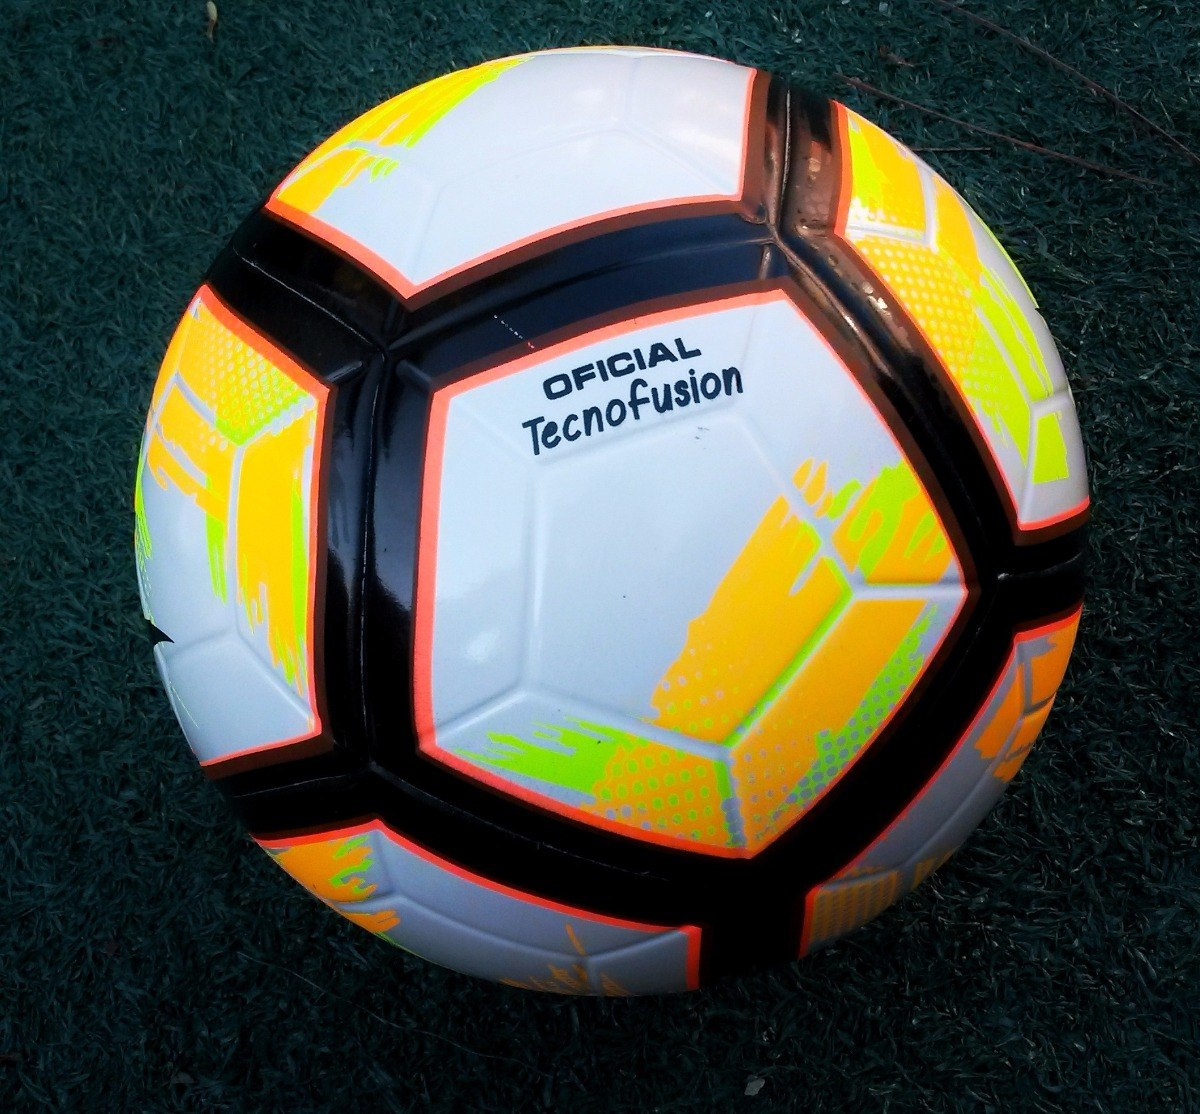 d860fb940d Bola Futebol Oficial Campo Kagiva Tecnofusion - R  75